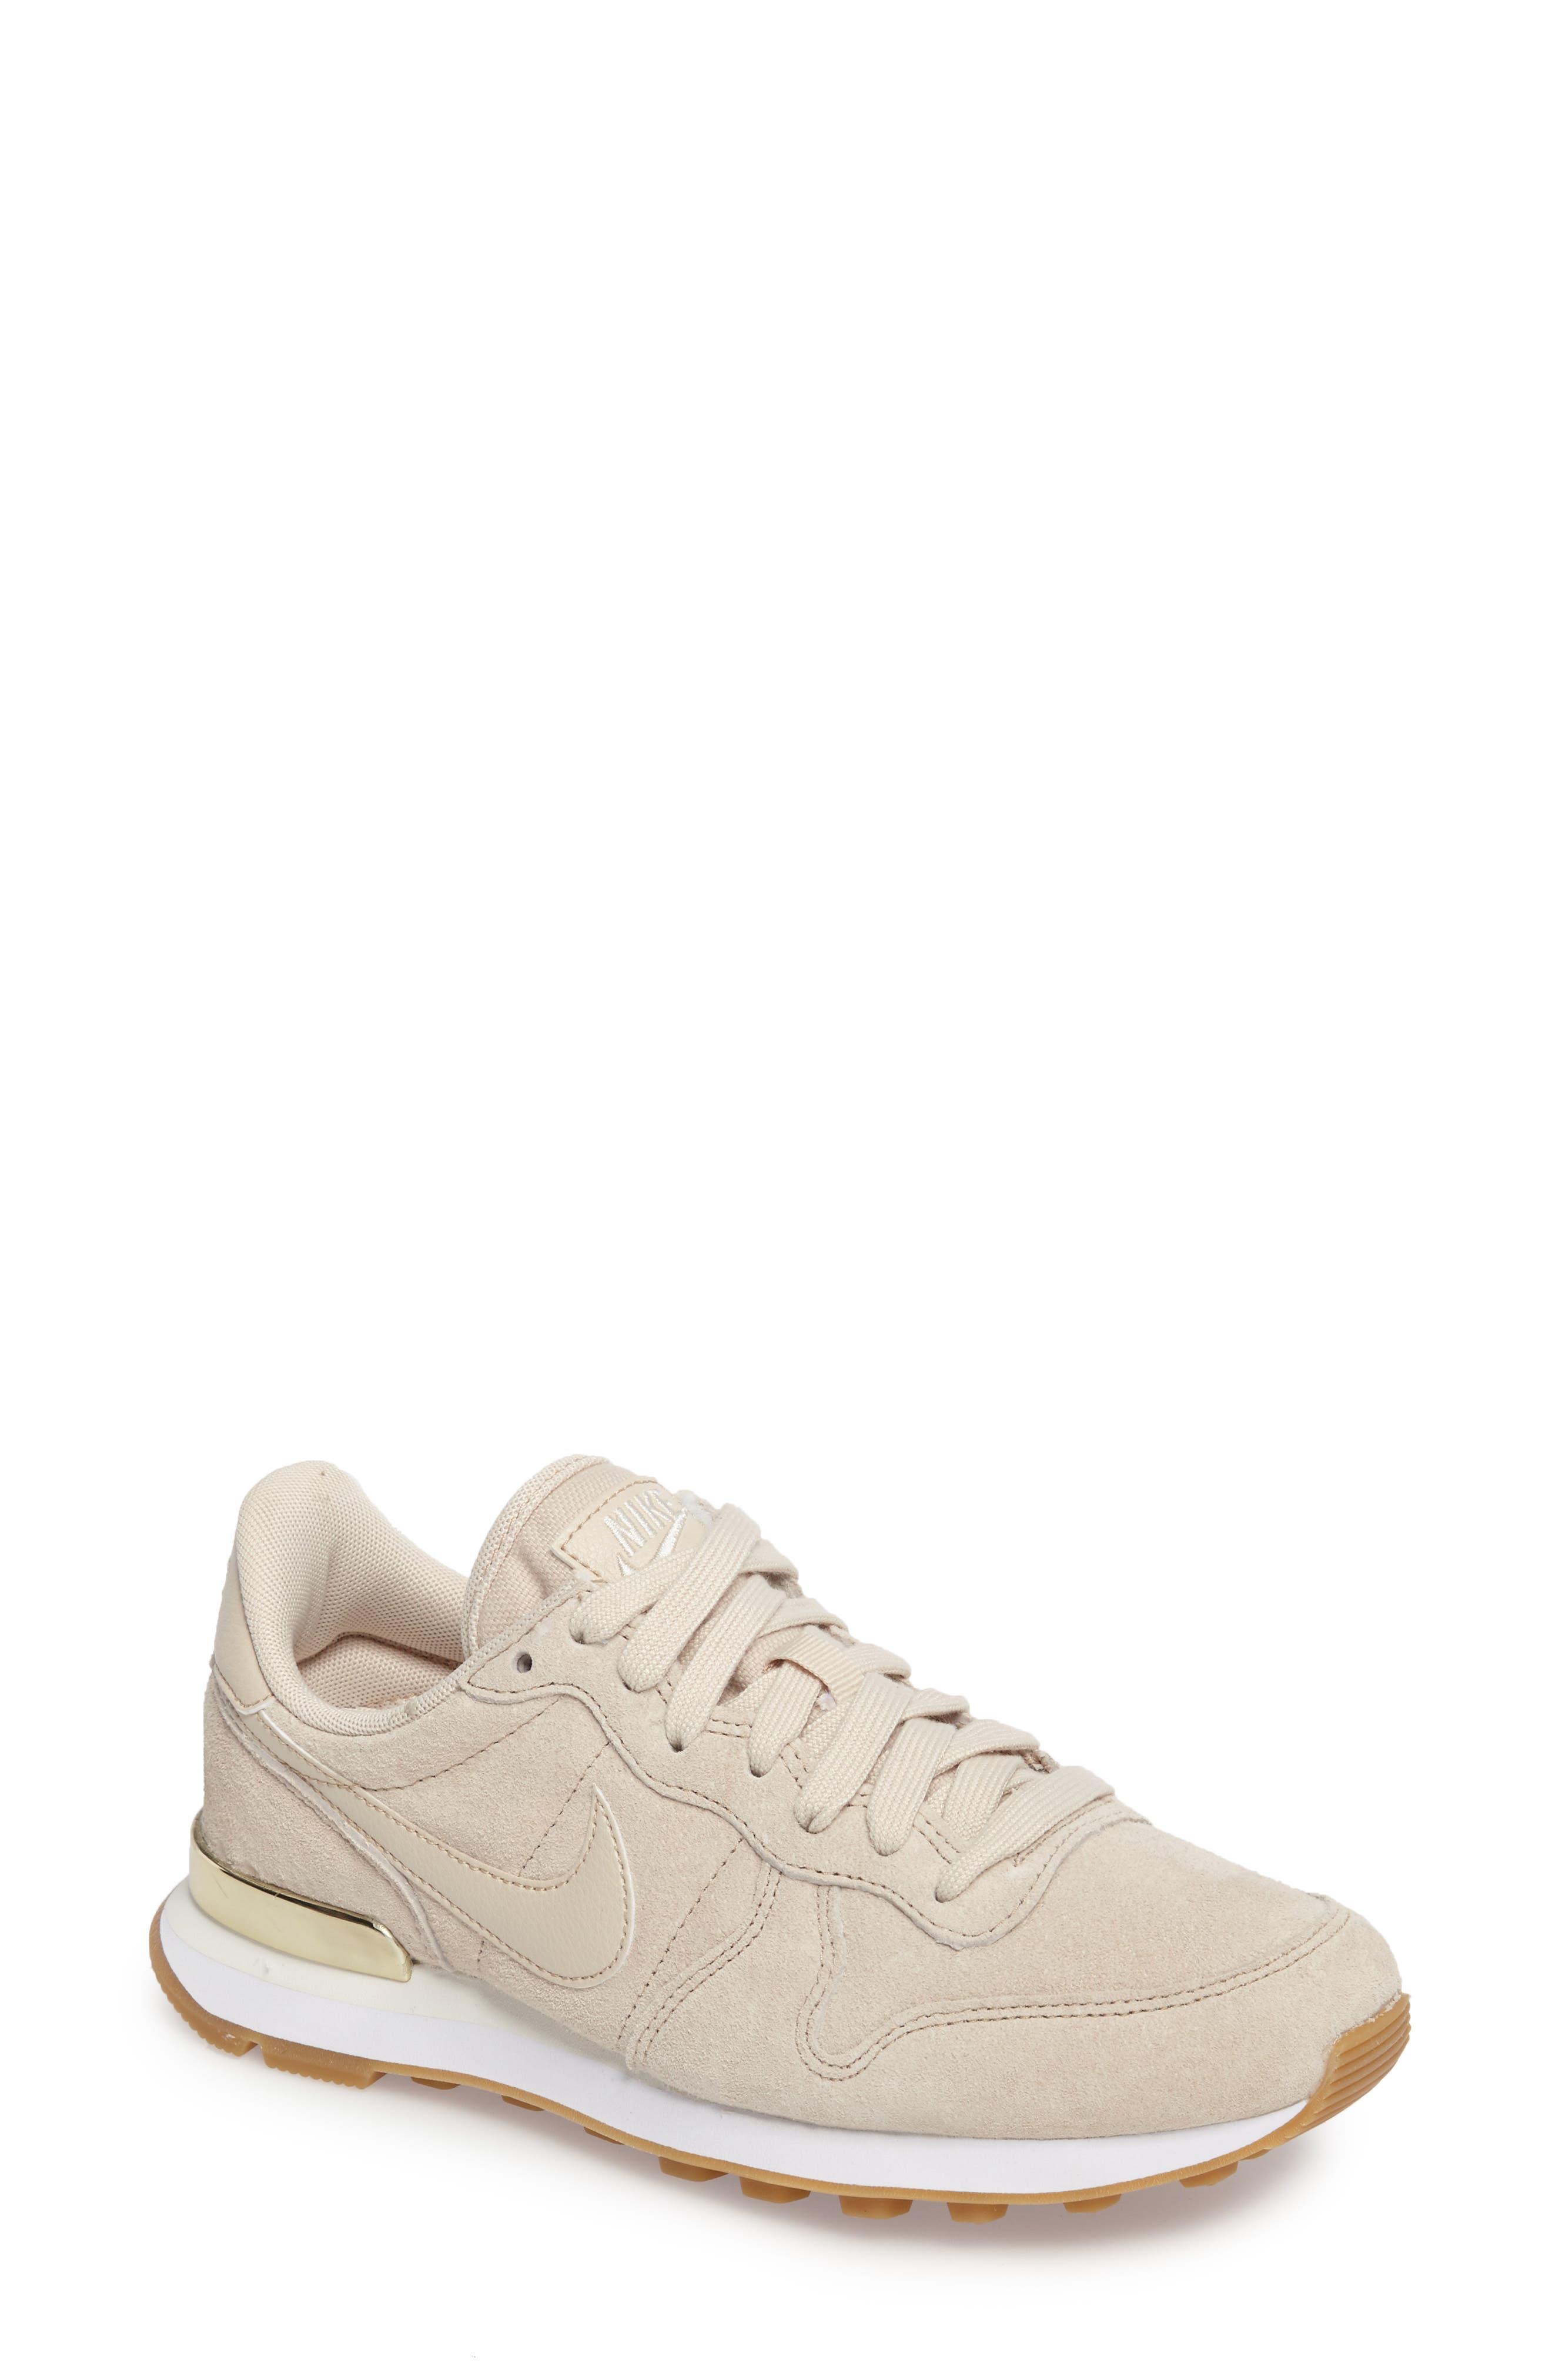 Internationalist SD Sneaker,                         Main,                         color, 250